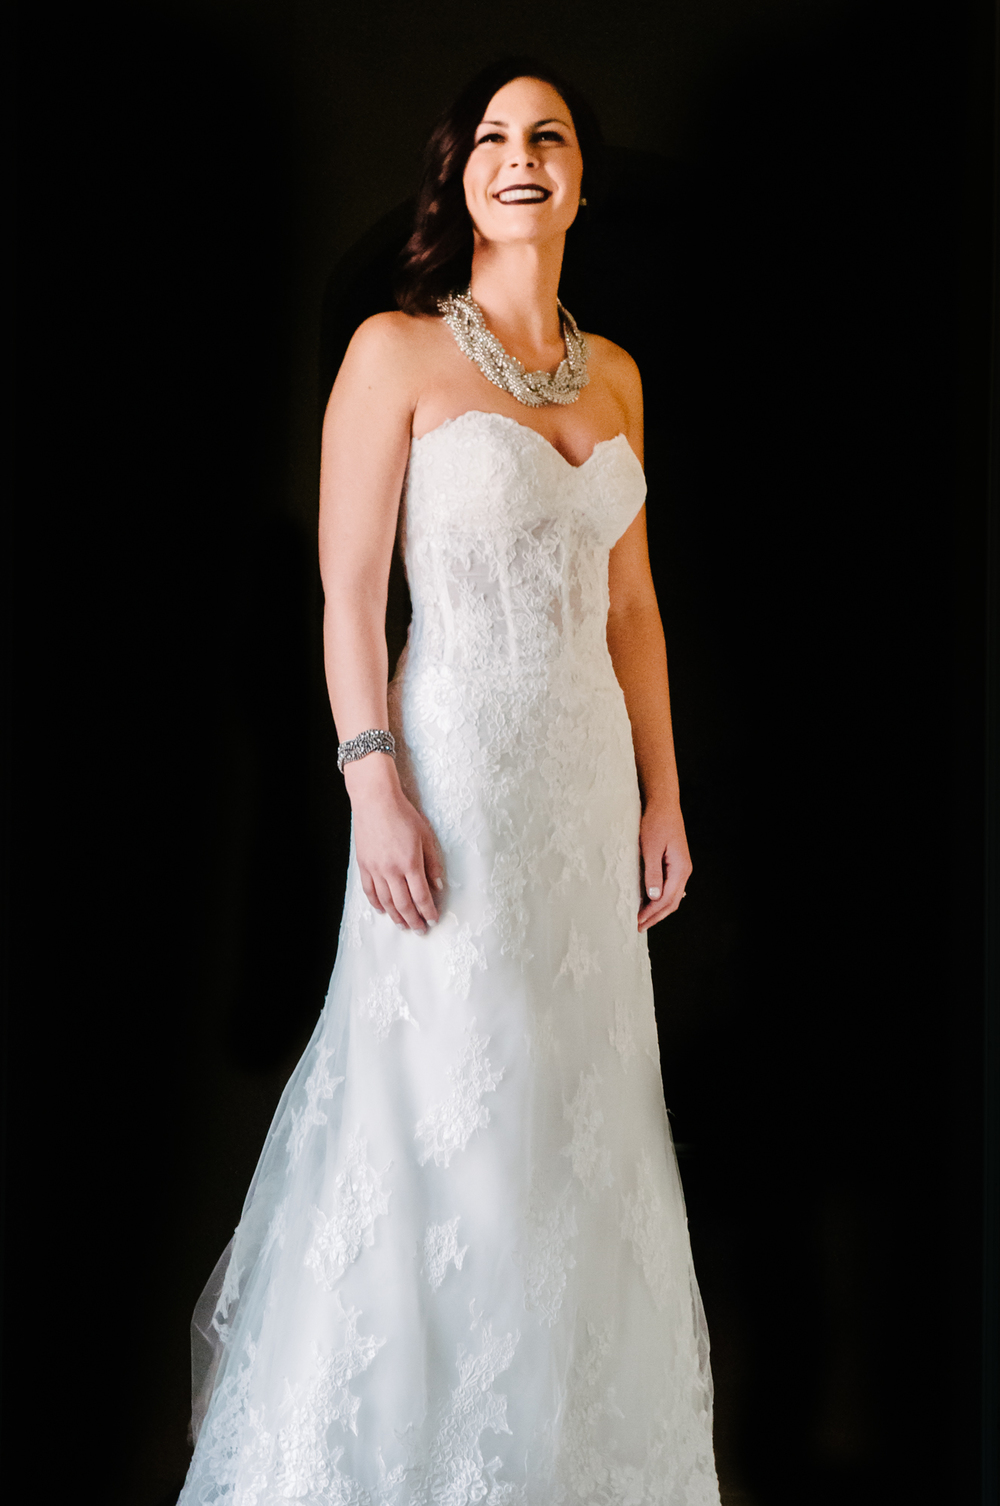 Tehachapi Wedding (14).jpg